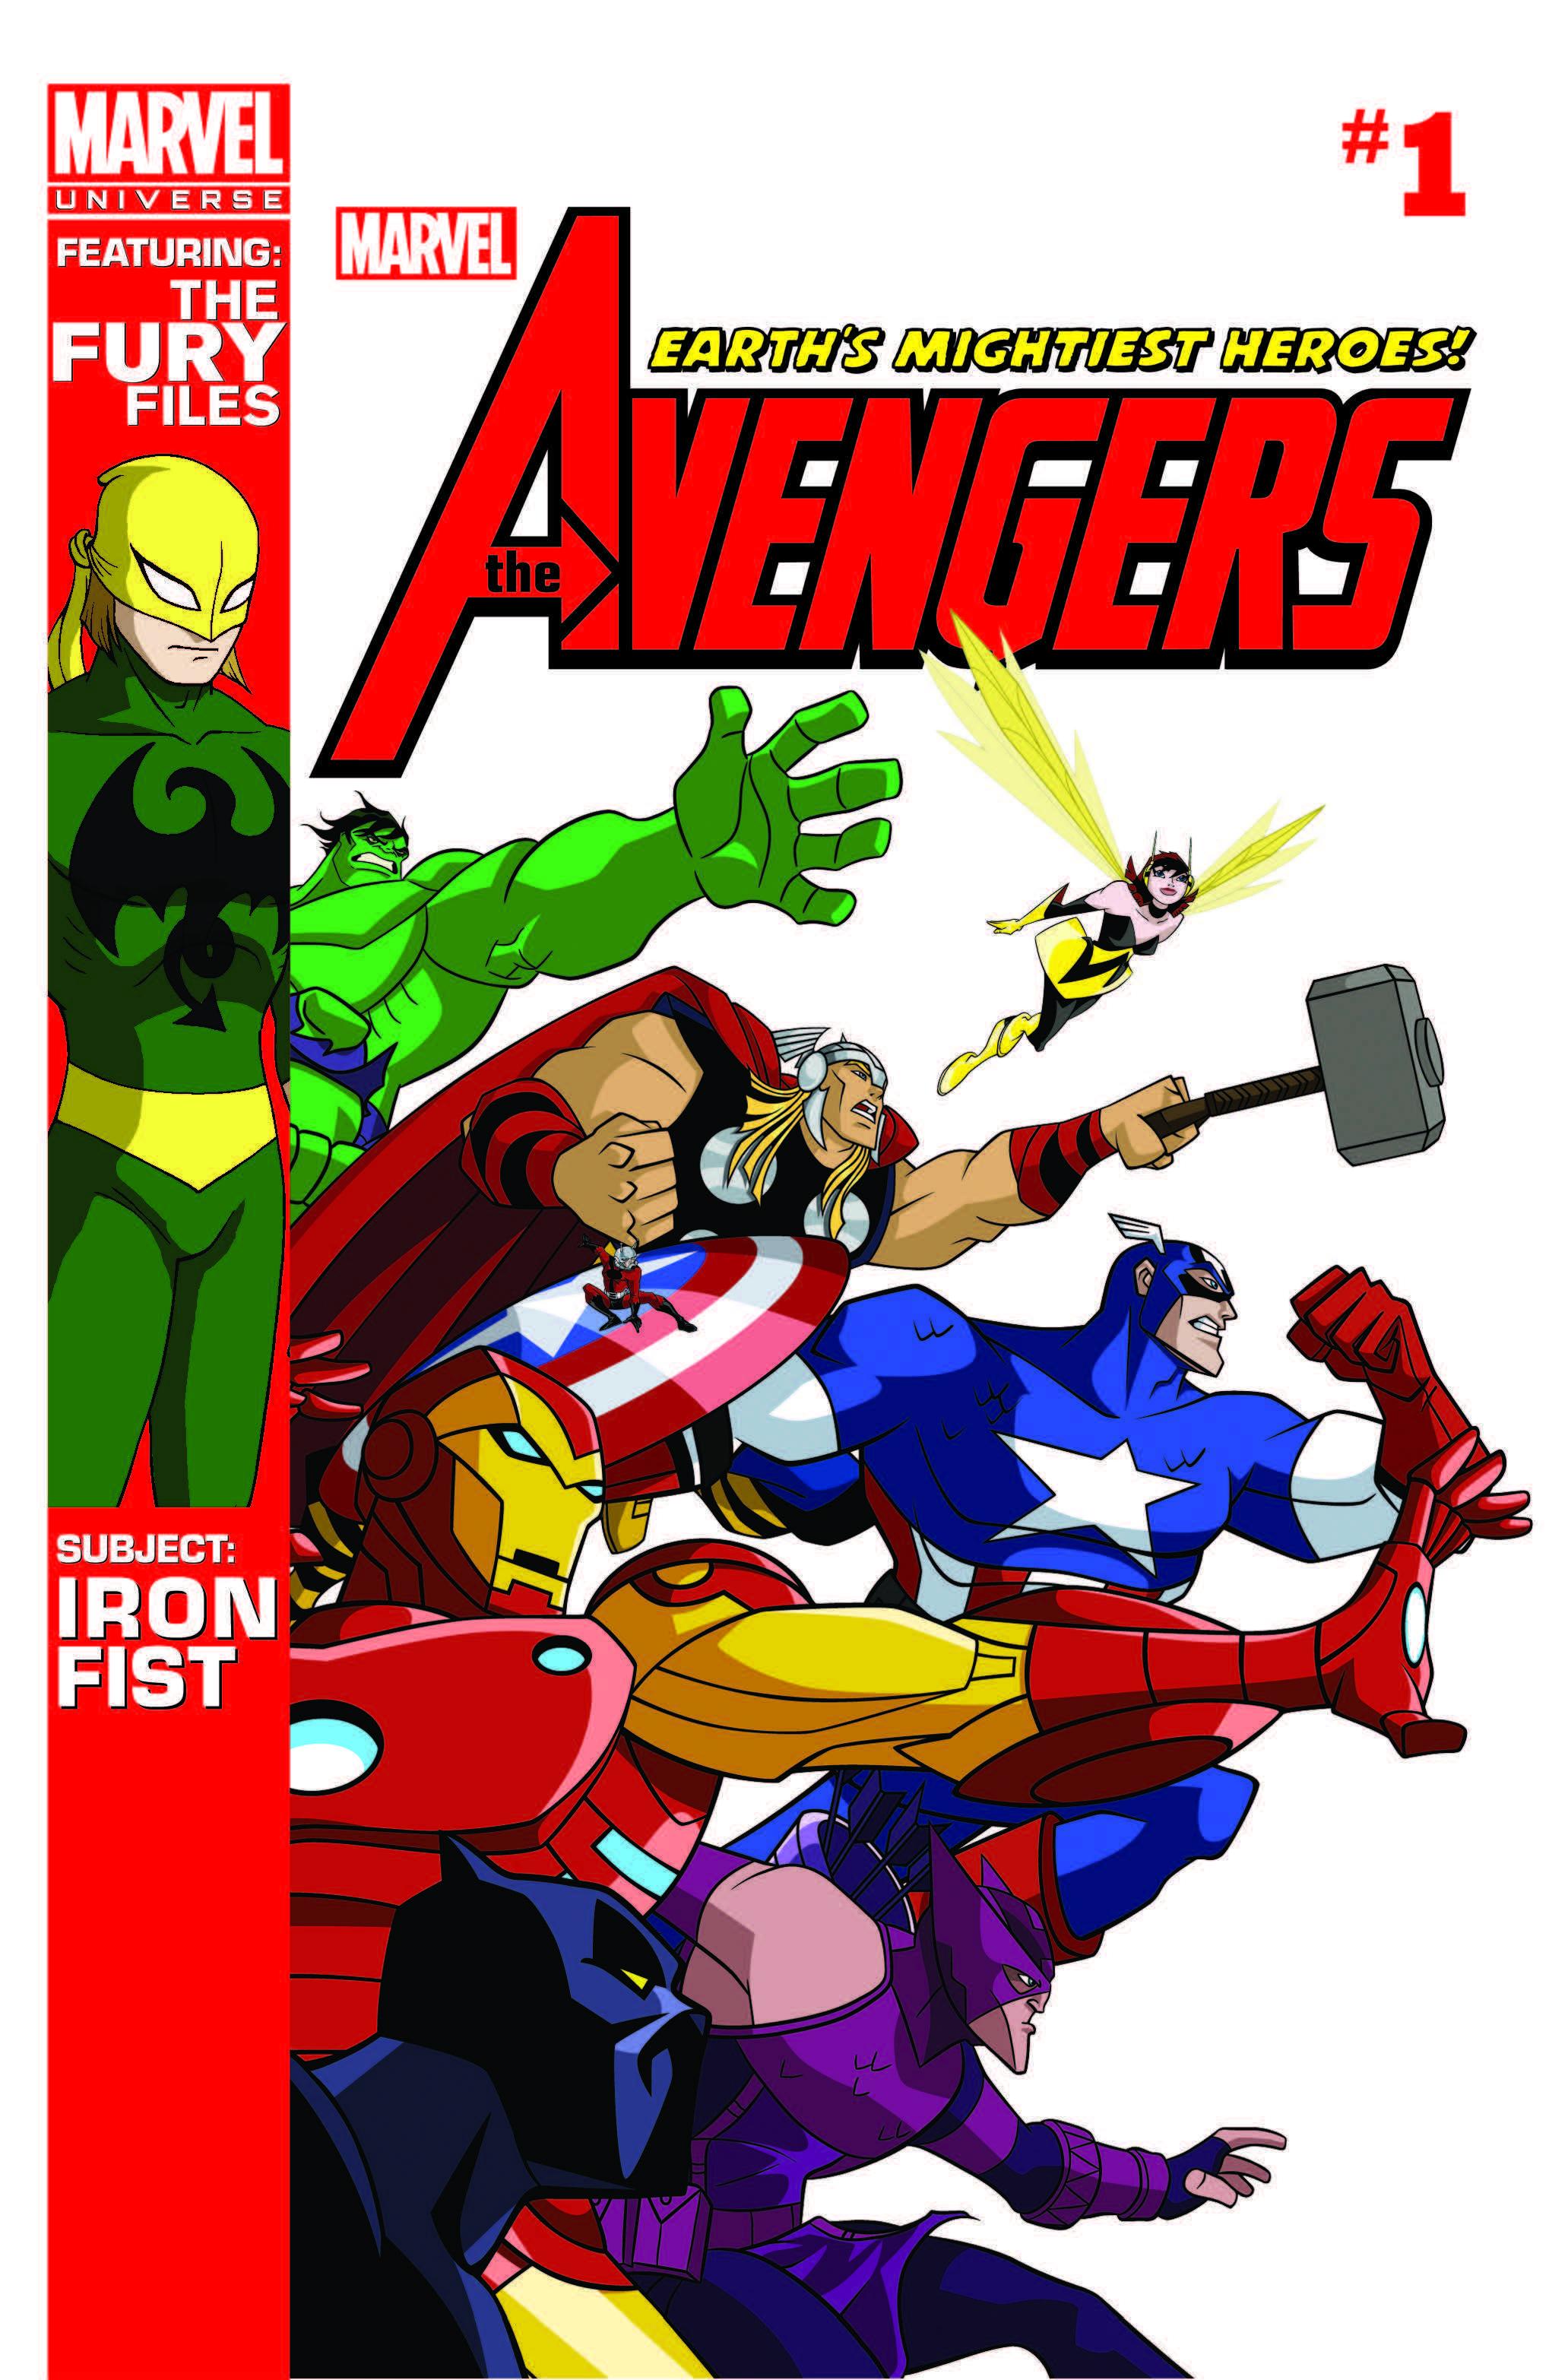 Marvel Universe Avengers: Earth's Mightiest Heroes (2012) #1